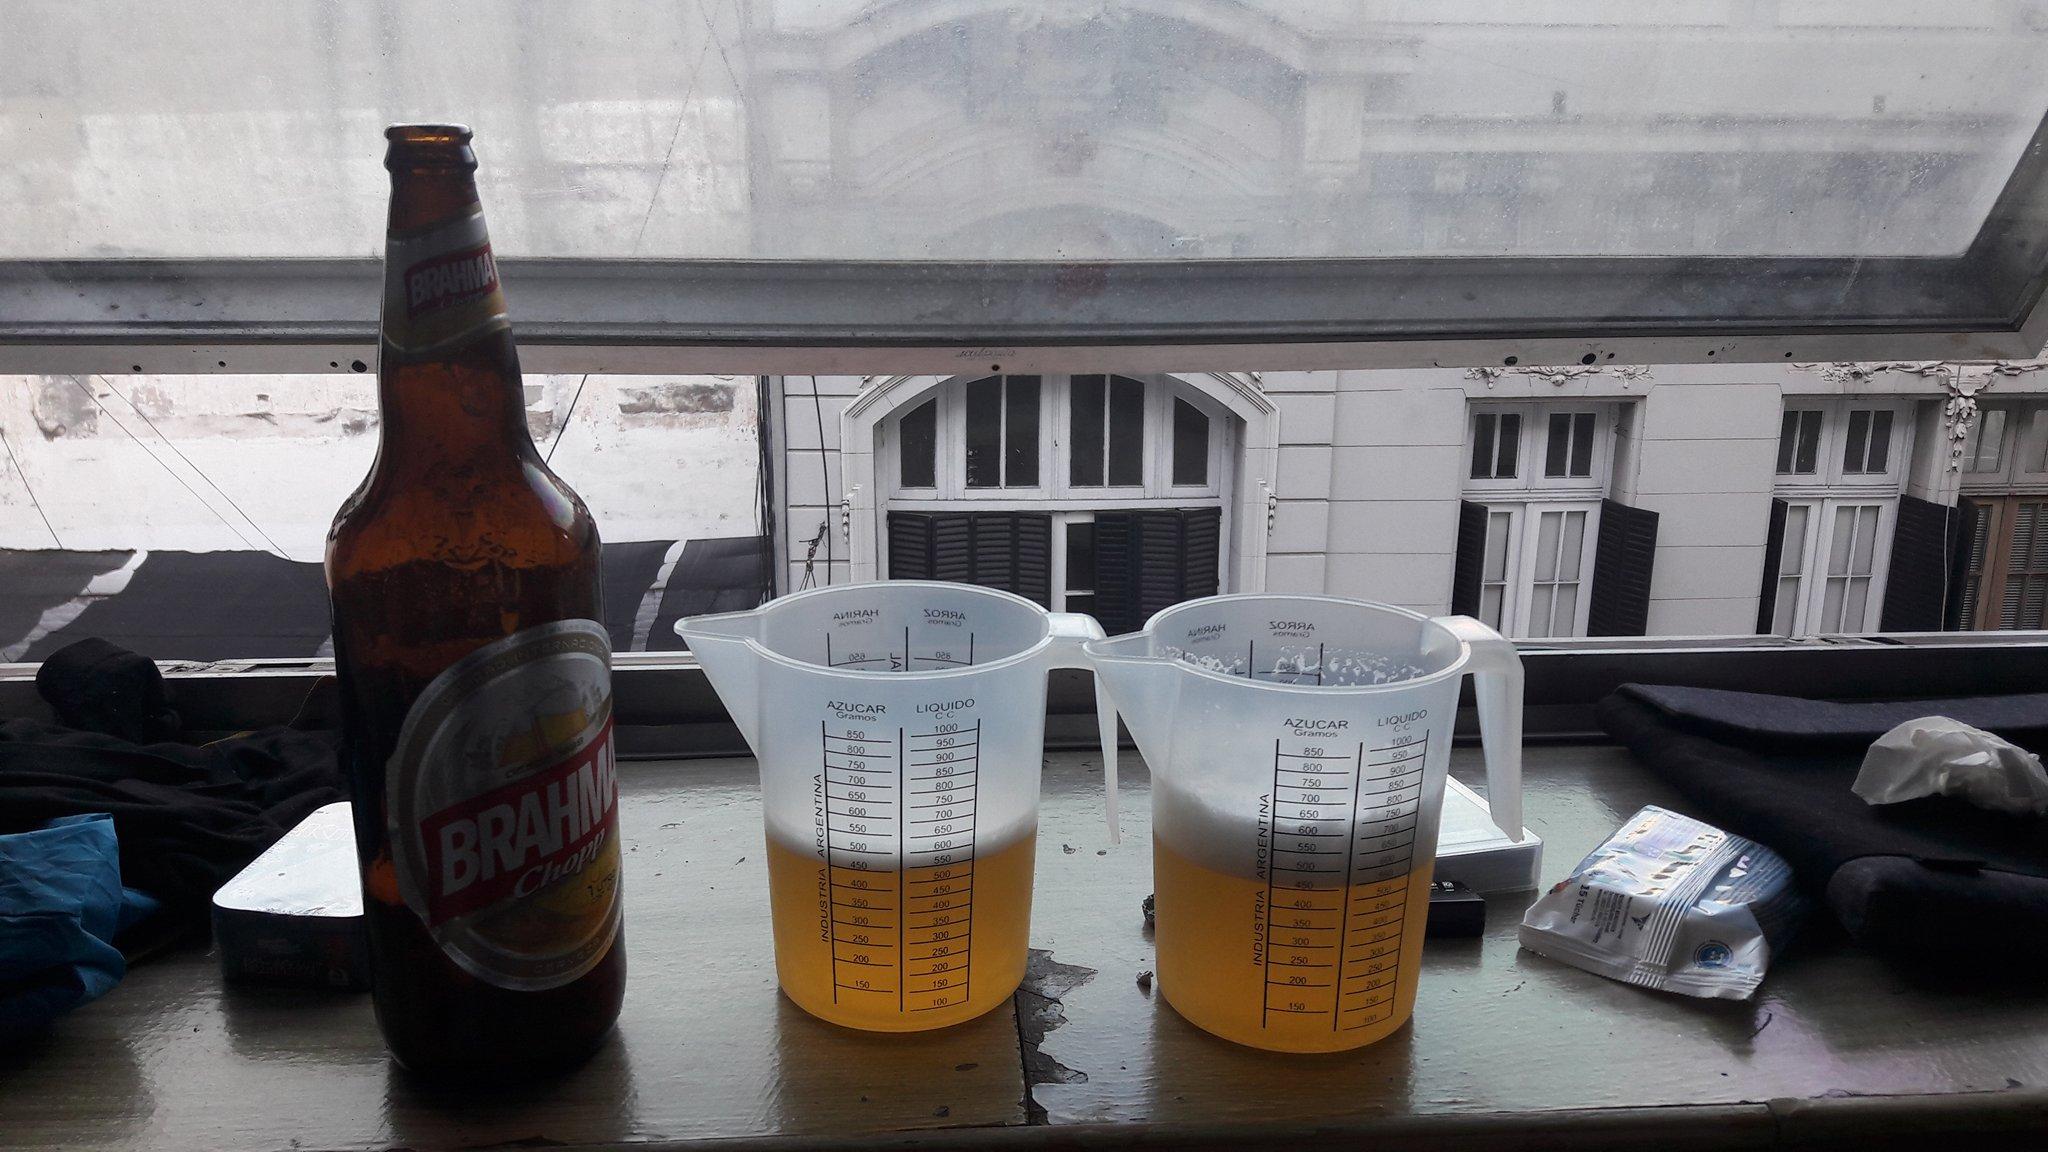 30.11.16 Bier aus Maßkrügen